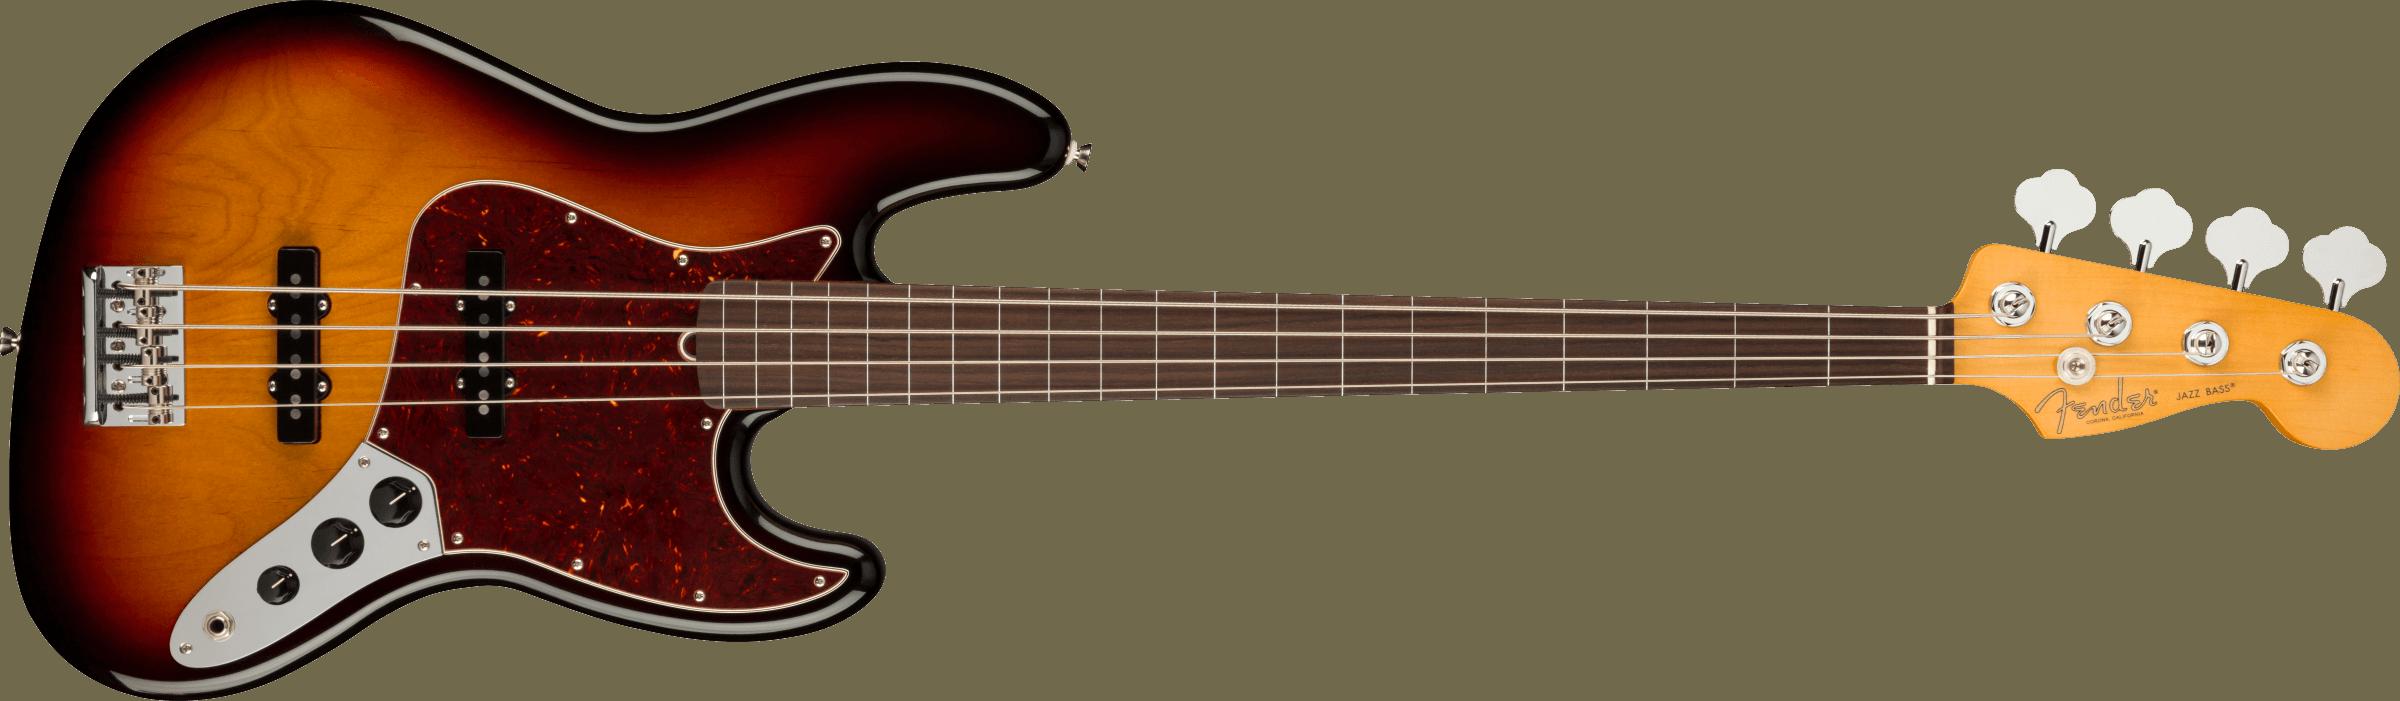 FENDER-American-Professional-II-Jazz-Bass-Fretless-Rosewood-Fingerboard-3-Color-Sunburst-sku-571005255